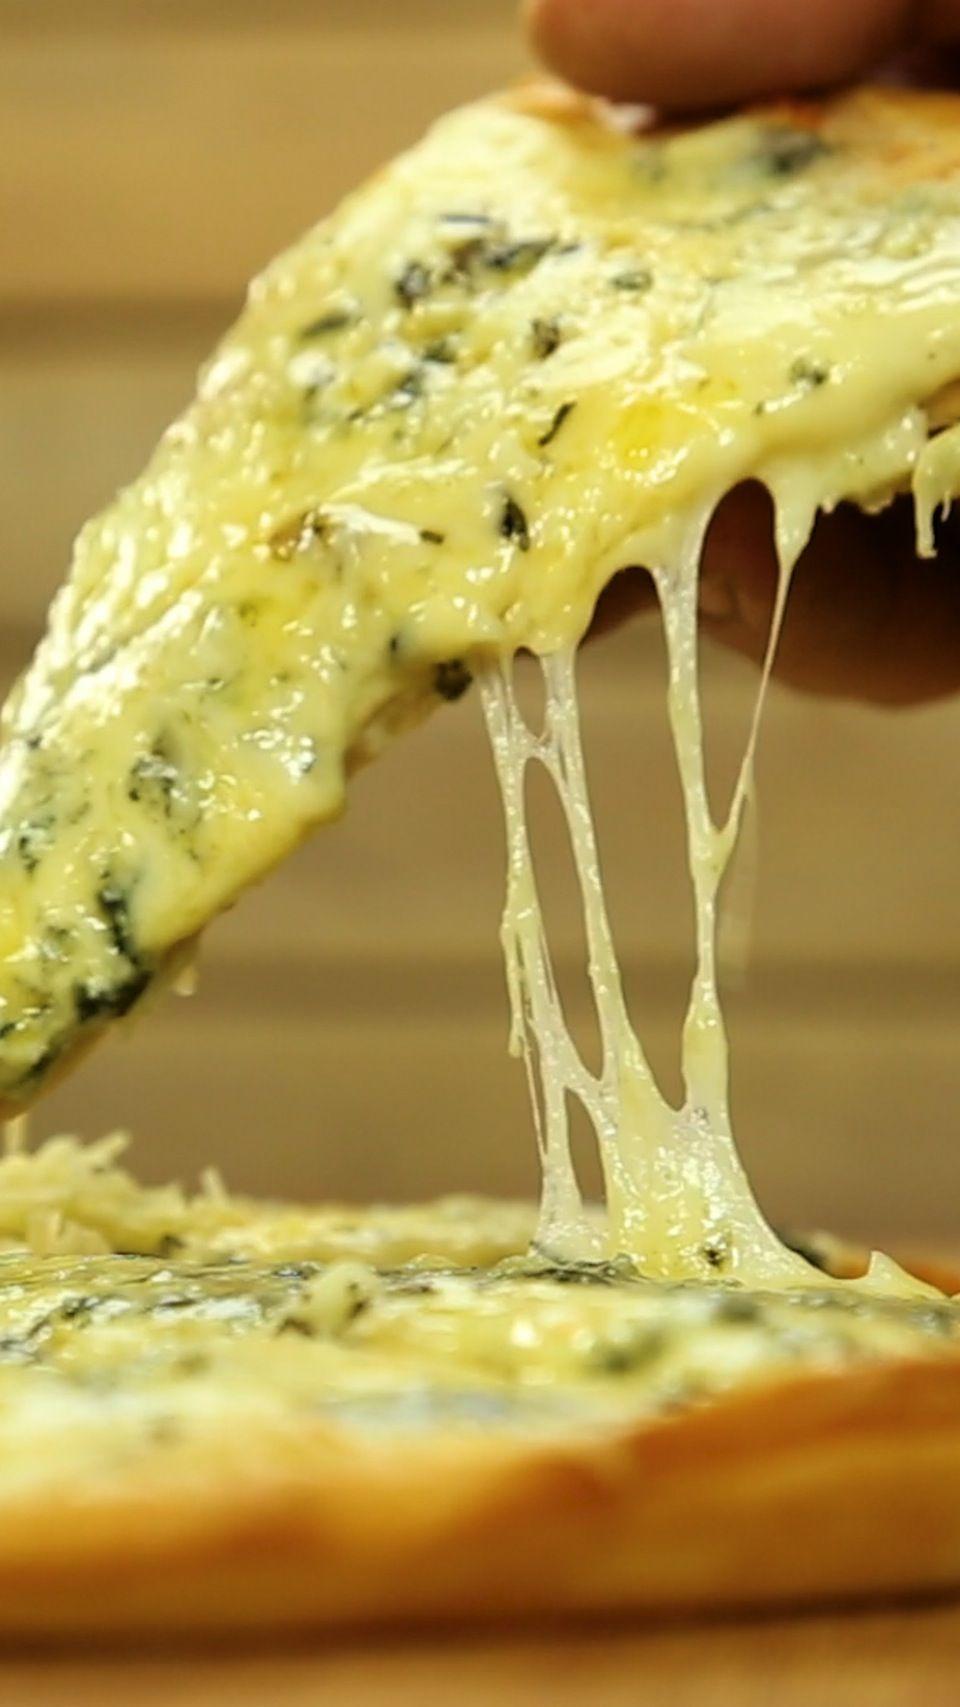 Falsa Pizza De Cuatro Quesos Receta Recetas Faciles De Comida